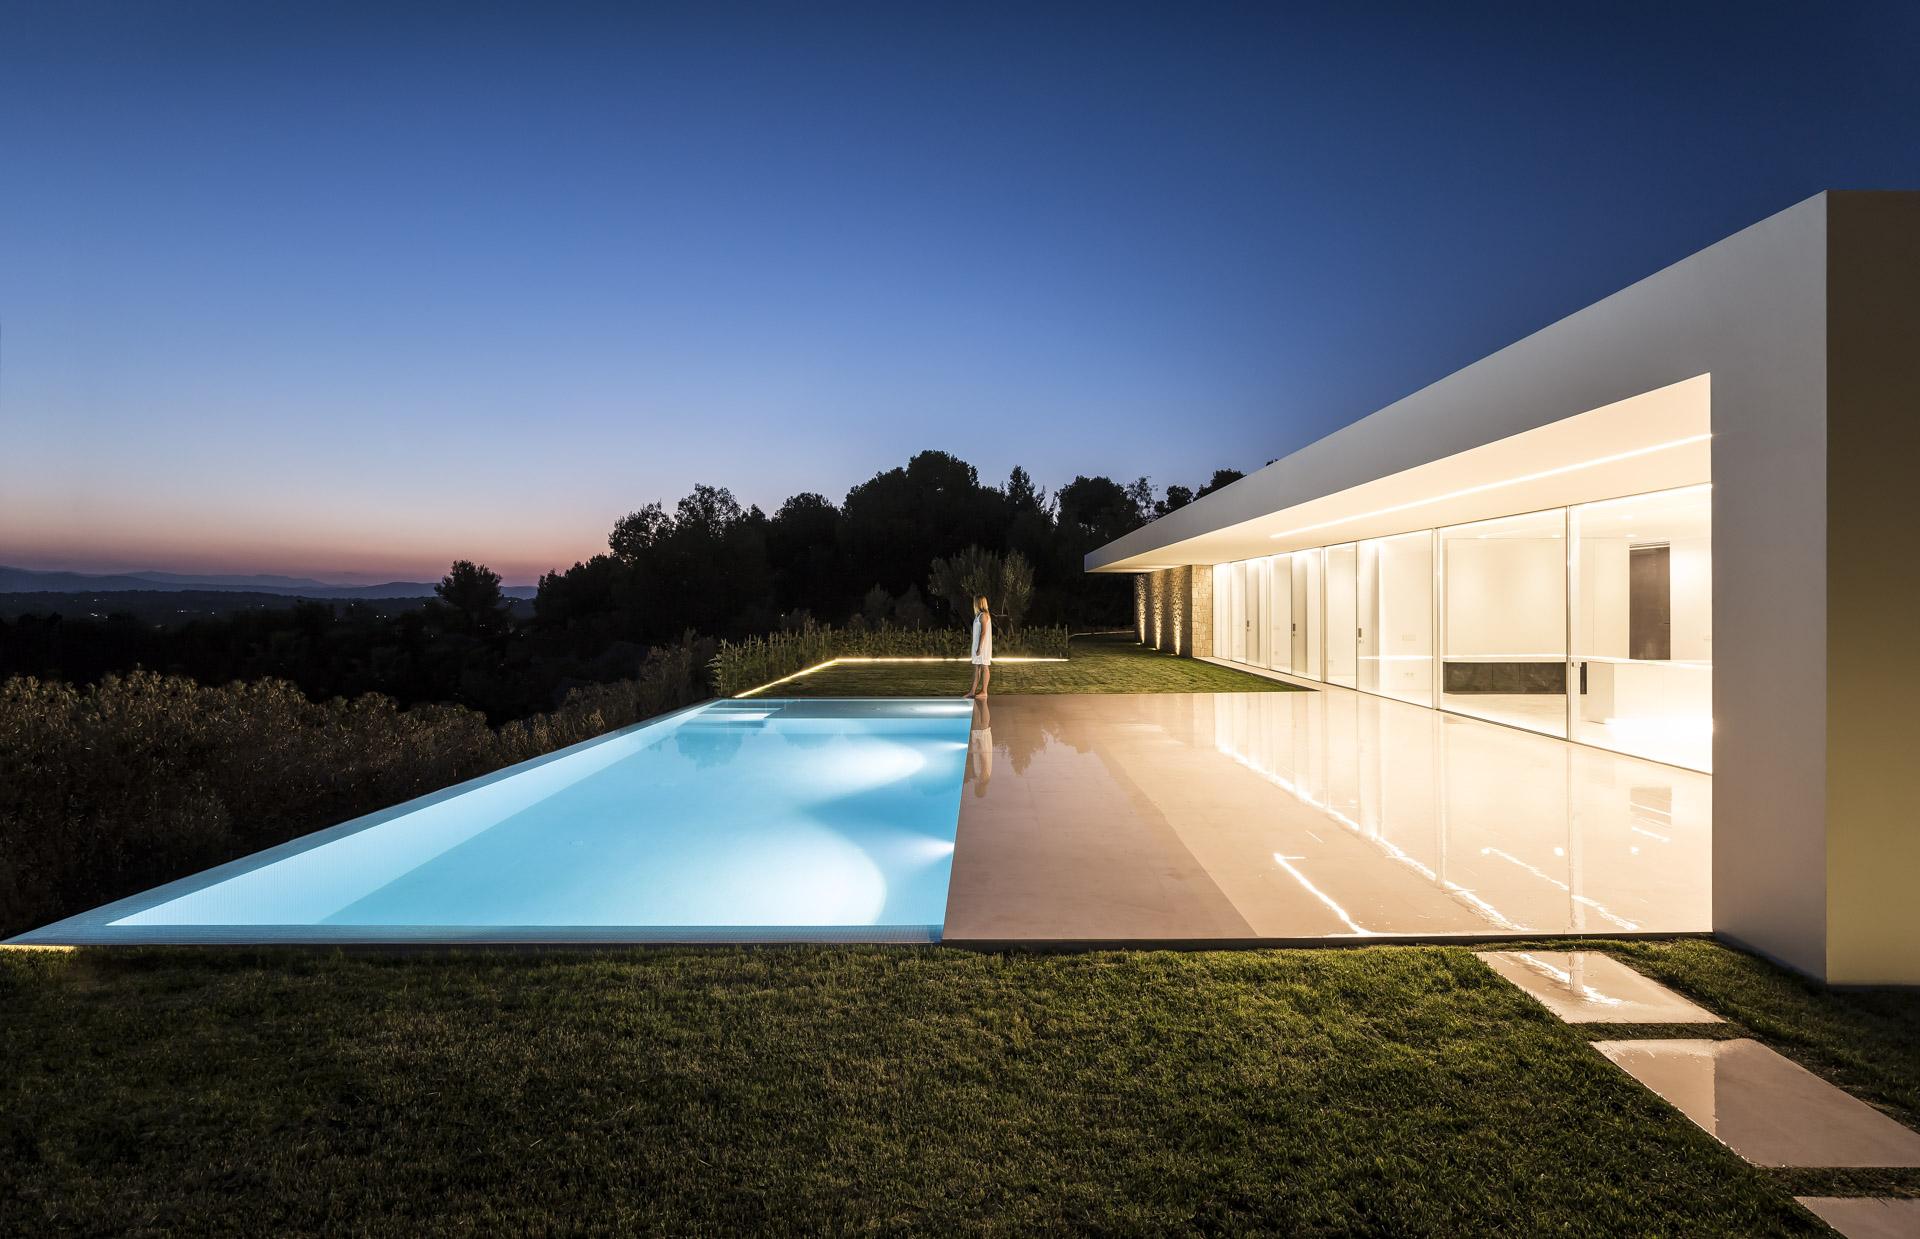 fotografia-arquitectura-valencia-german-cabo-gallardo-llopis-villamarchante-vivienda-65